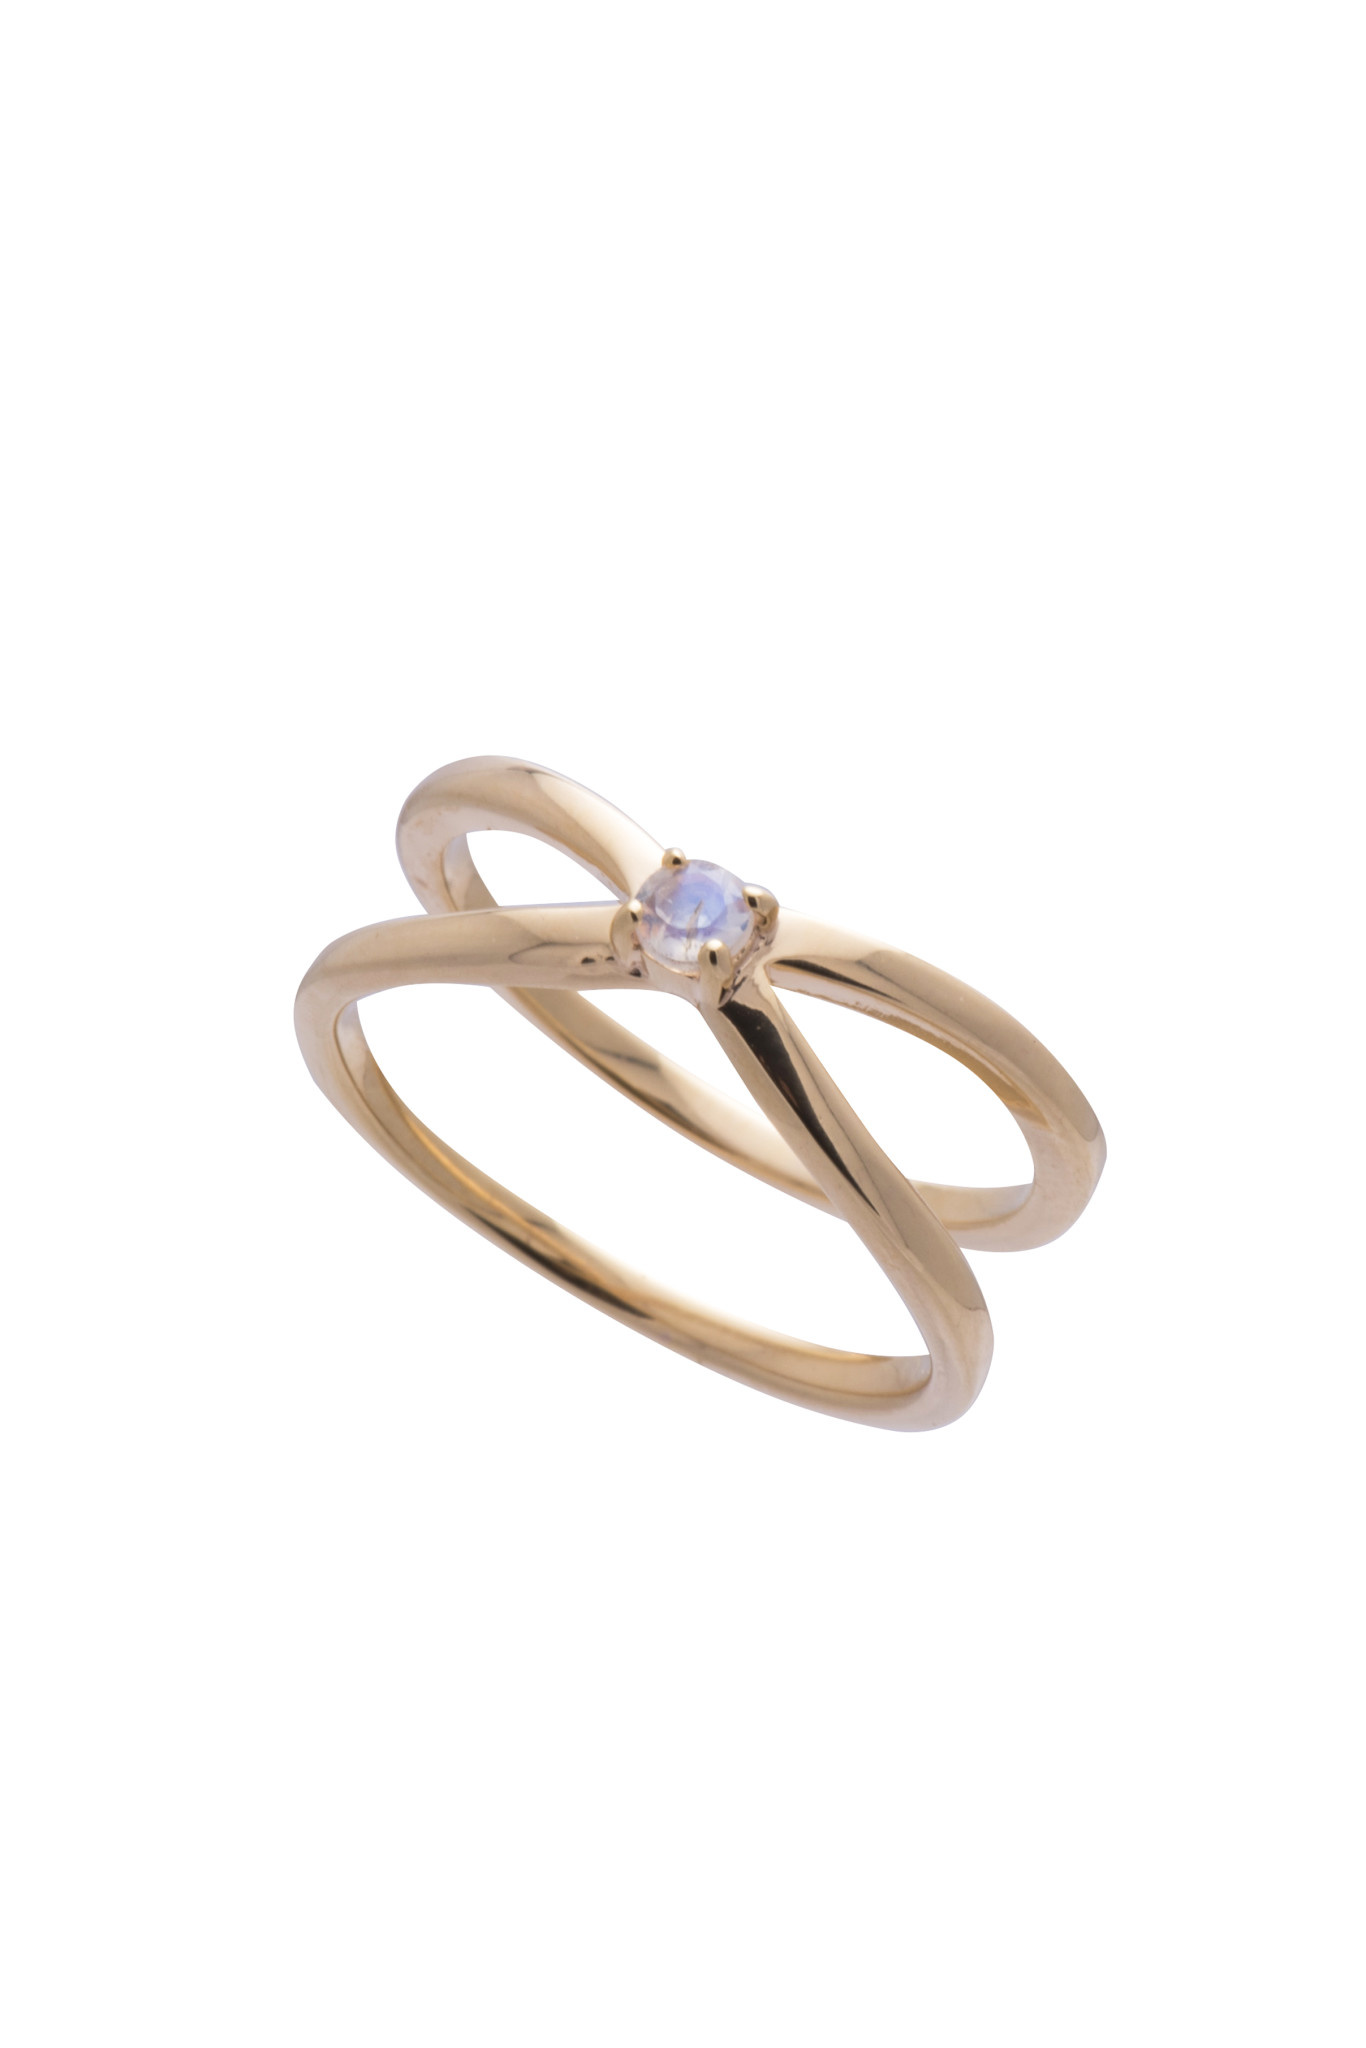 Sarah Mulder Jewelry Sarah Mulder Jewelry - Kriss Cross Ring